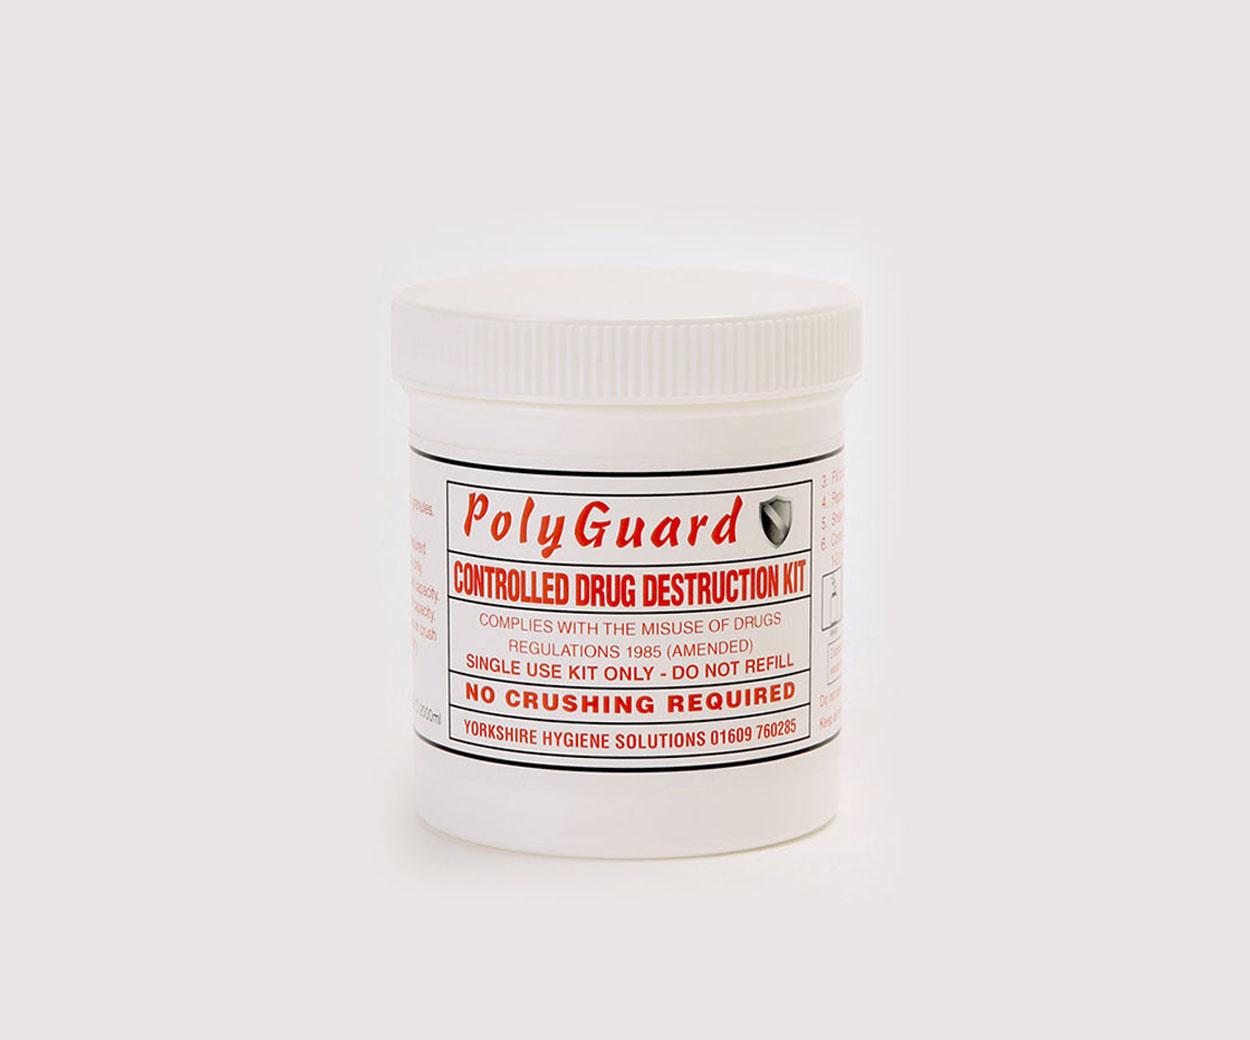 PolyGuard Controlled Drug Destruction Kits